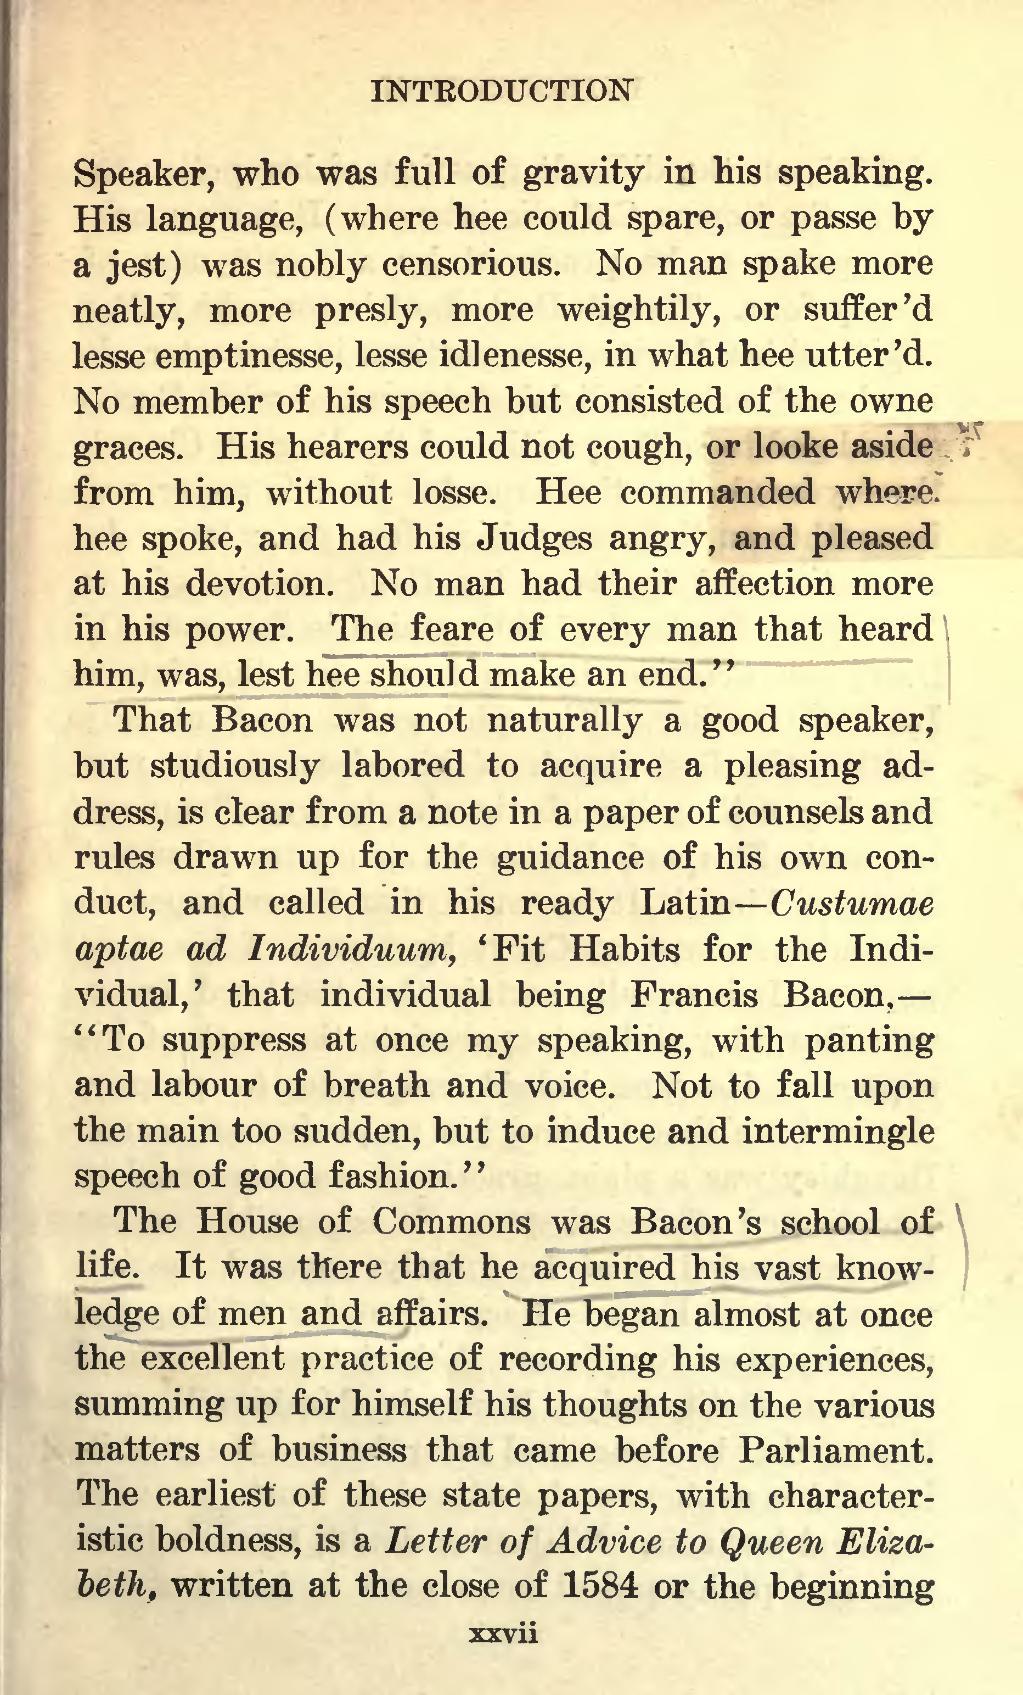 004 Essay Example Bacons Essays Page35 1024px Of Francis Bacon 1908 Scott Amazing Google Books Truth Quiz Bacon's Summary Full